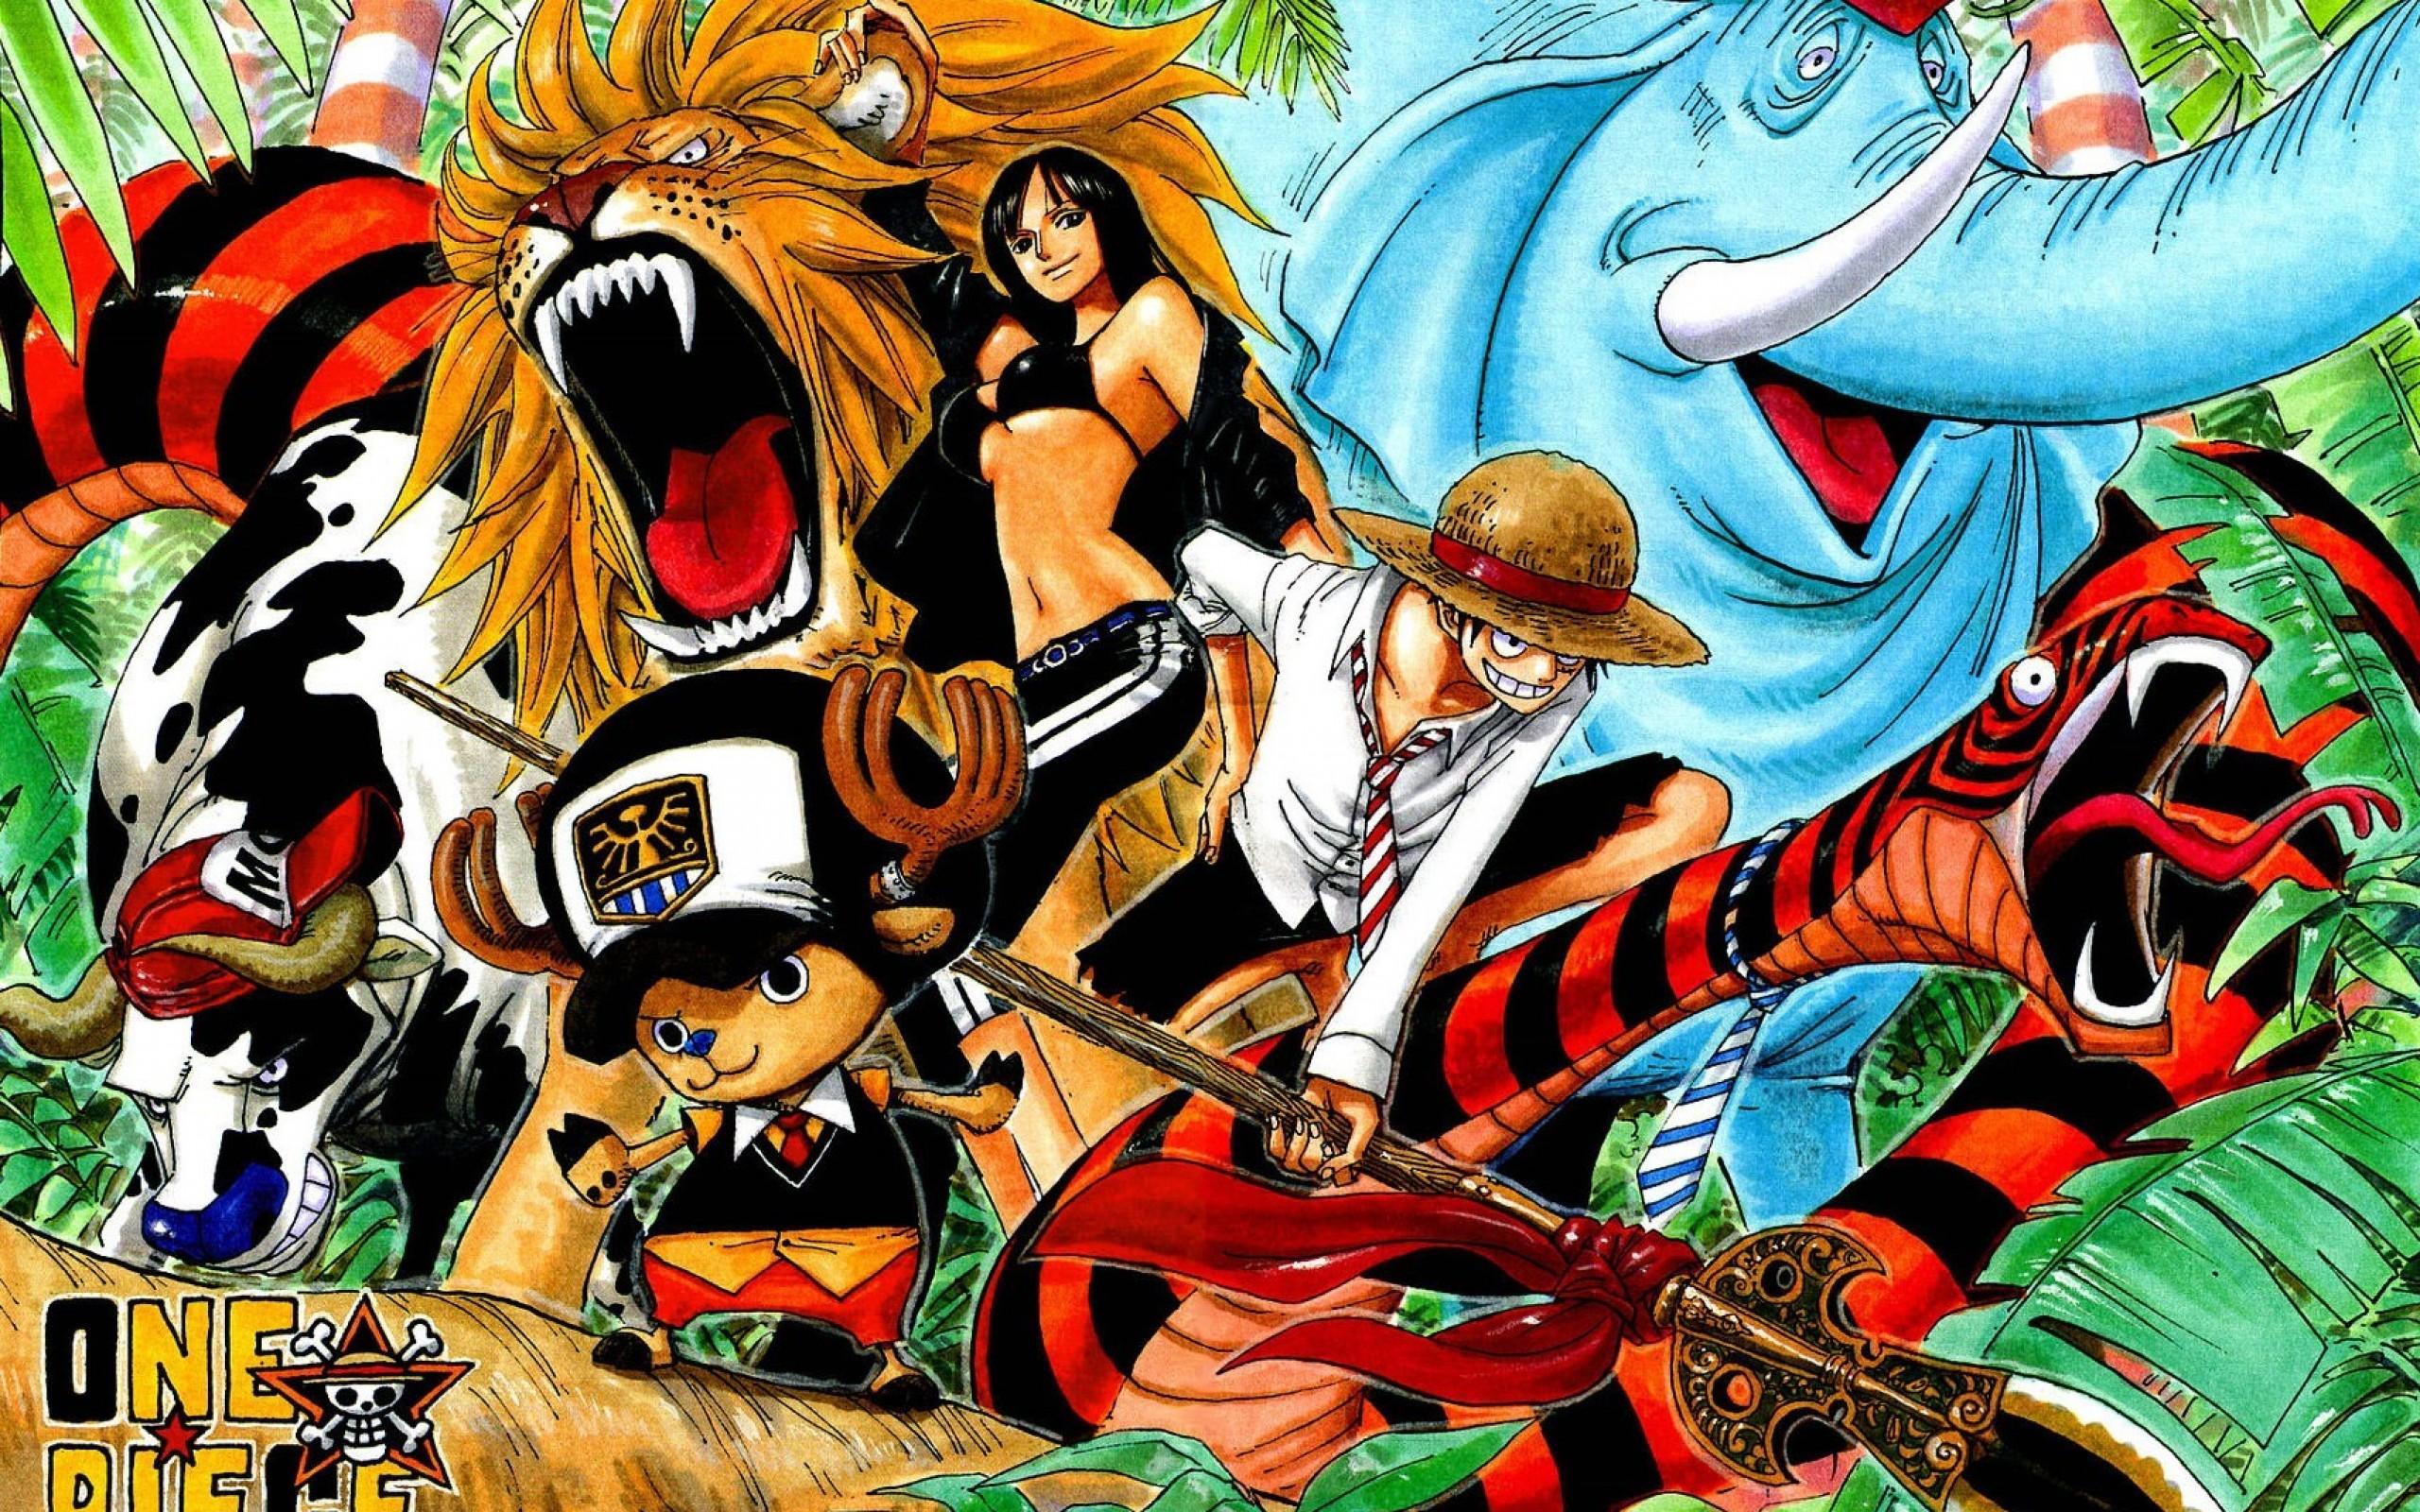 Wallpaper One Piece New World 3d One Piece Wallpapers Archives Hd Desktop Wallpapers 4k Hd